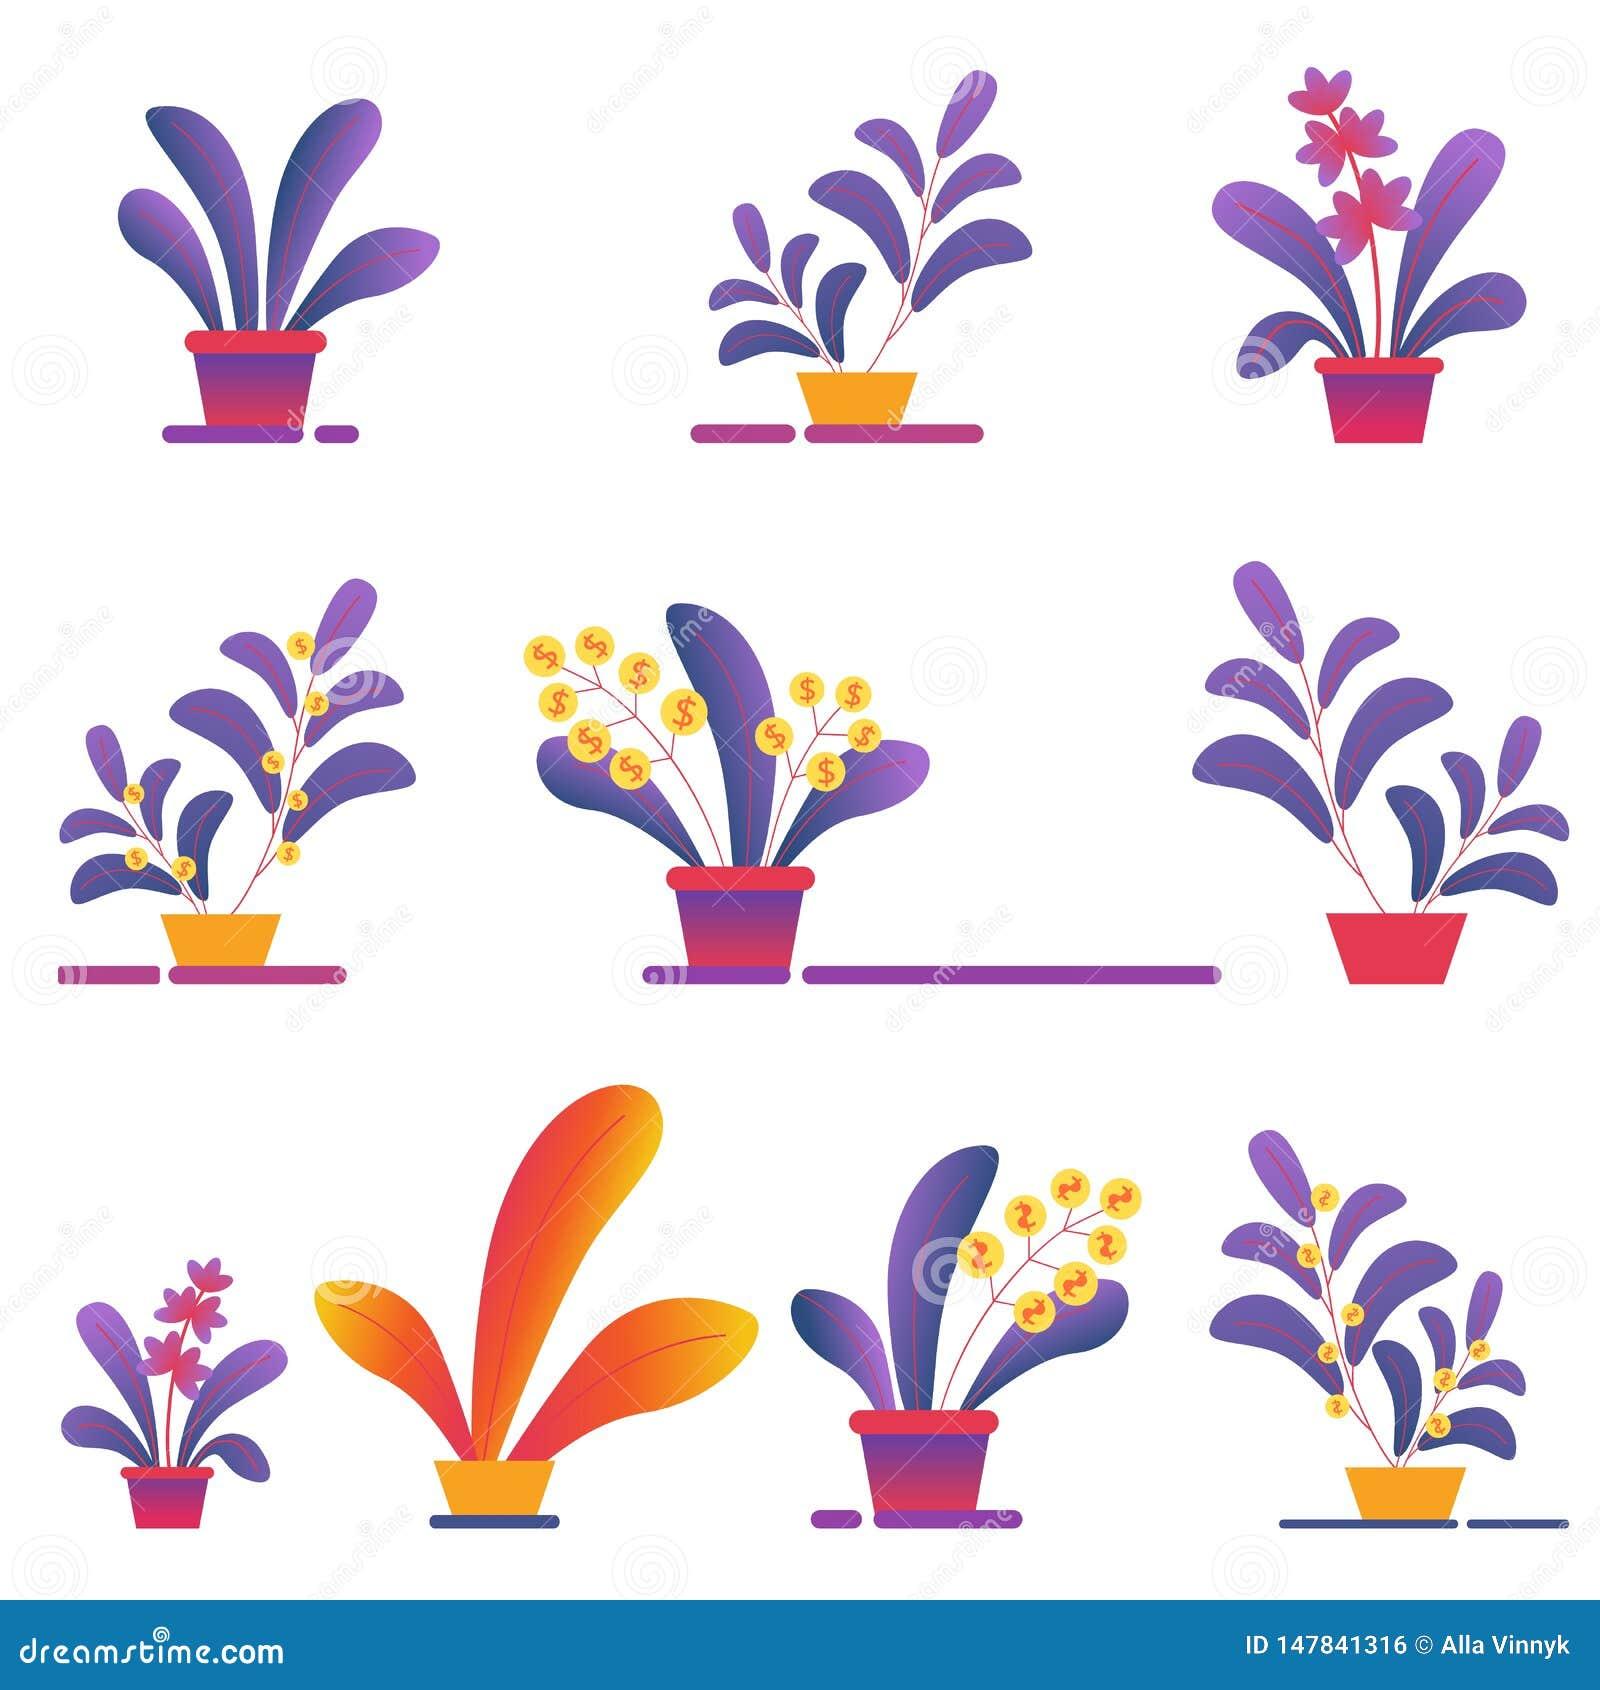 Seamless Pattern of Money Homeplants Grow in Pots